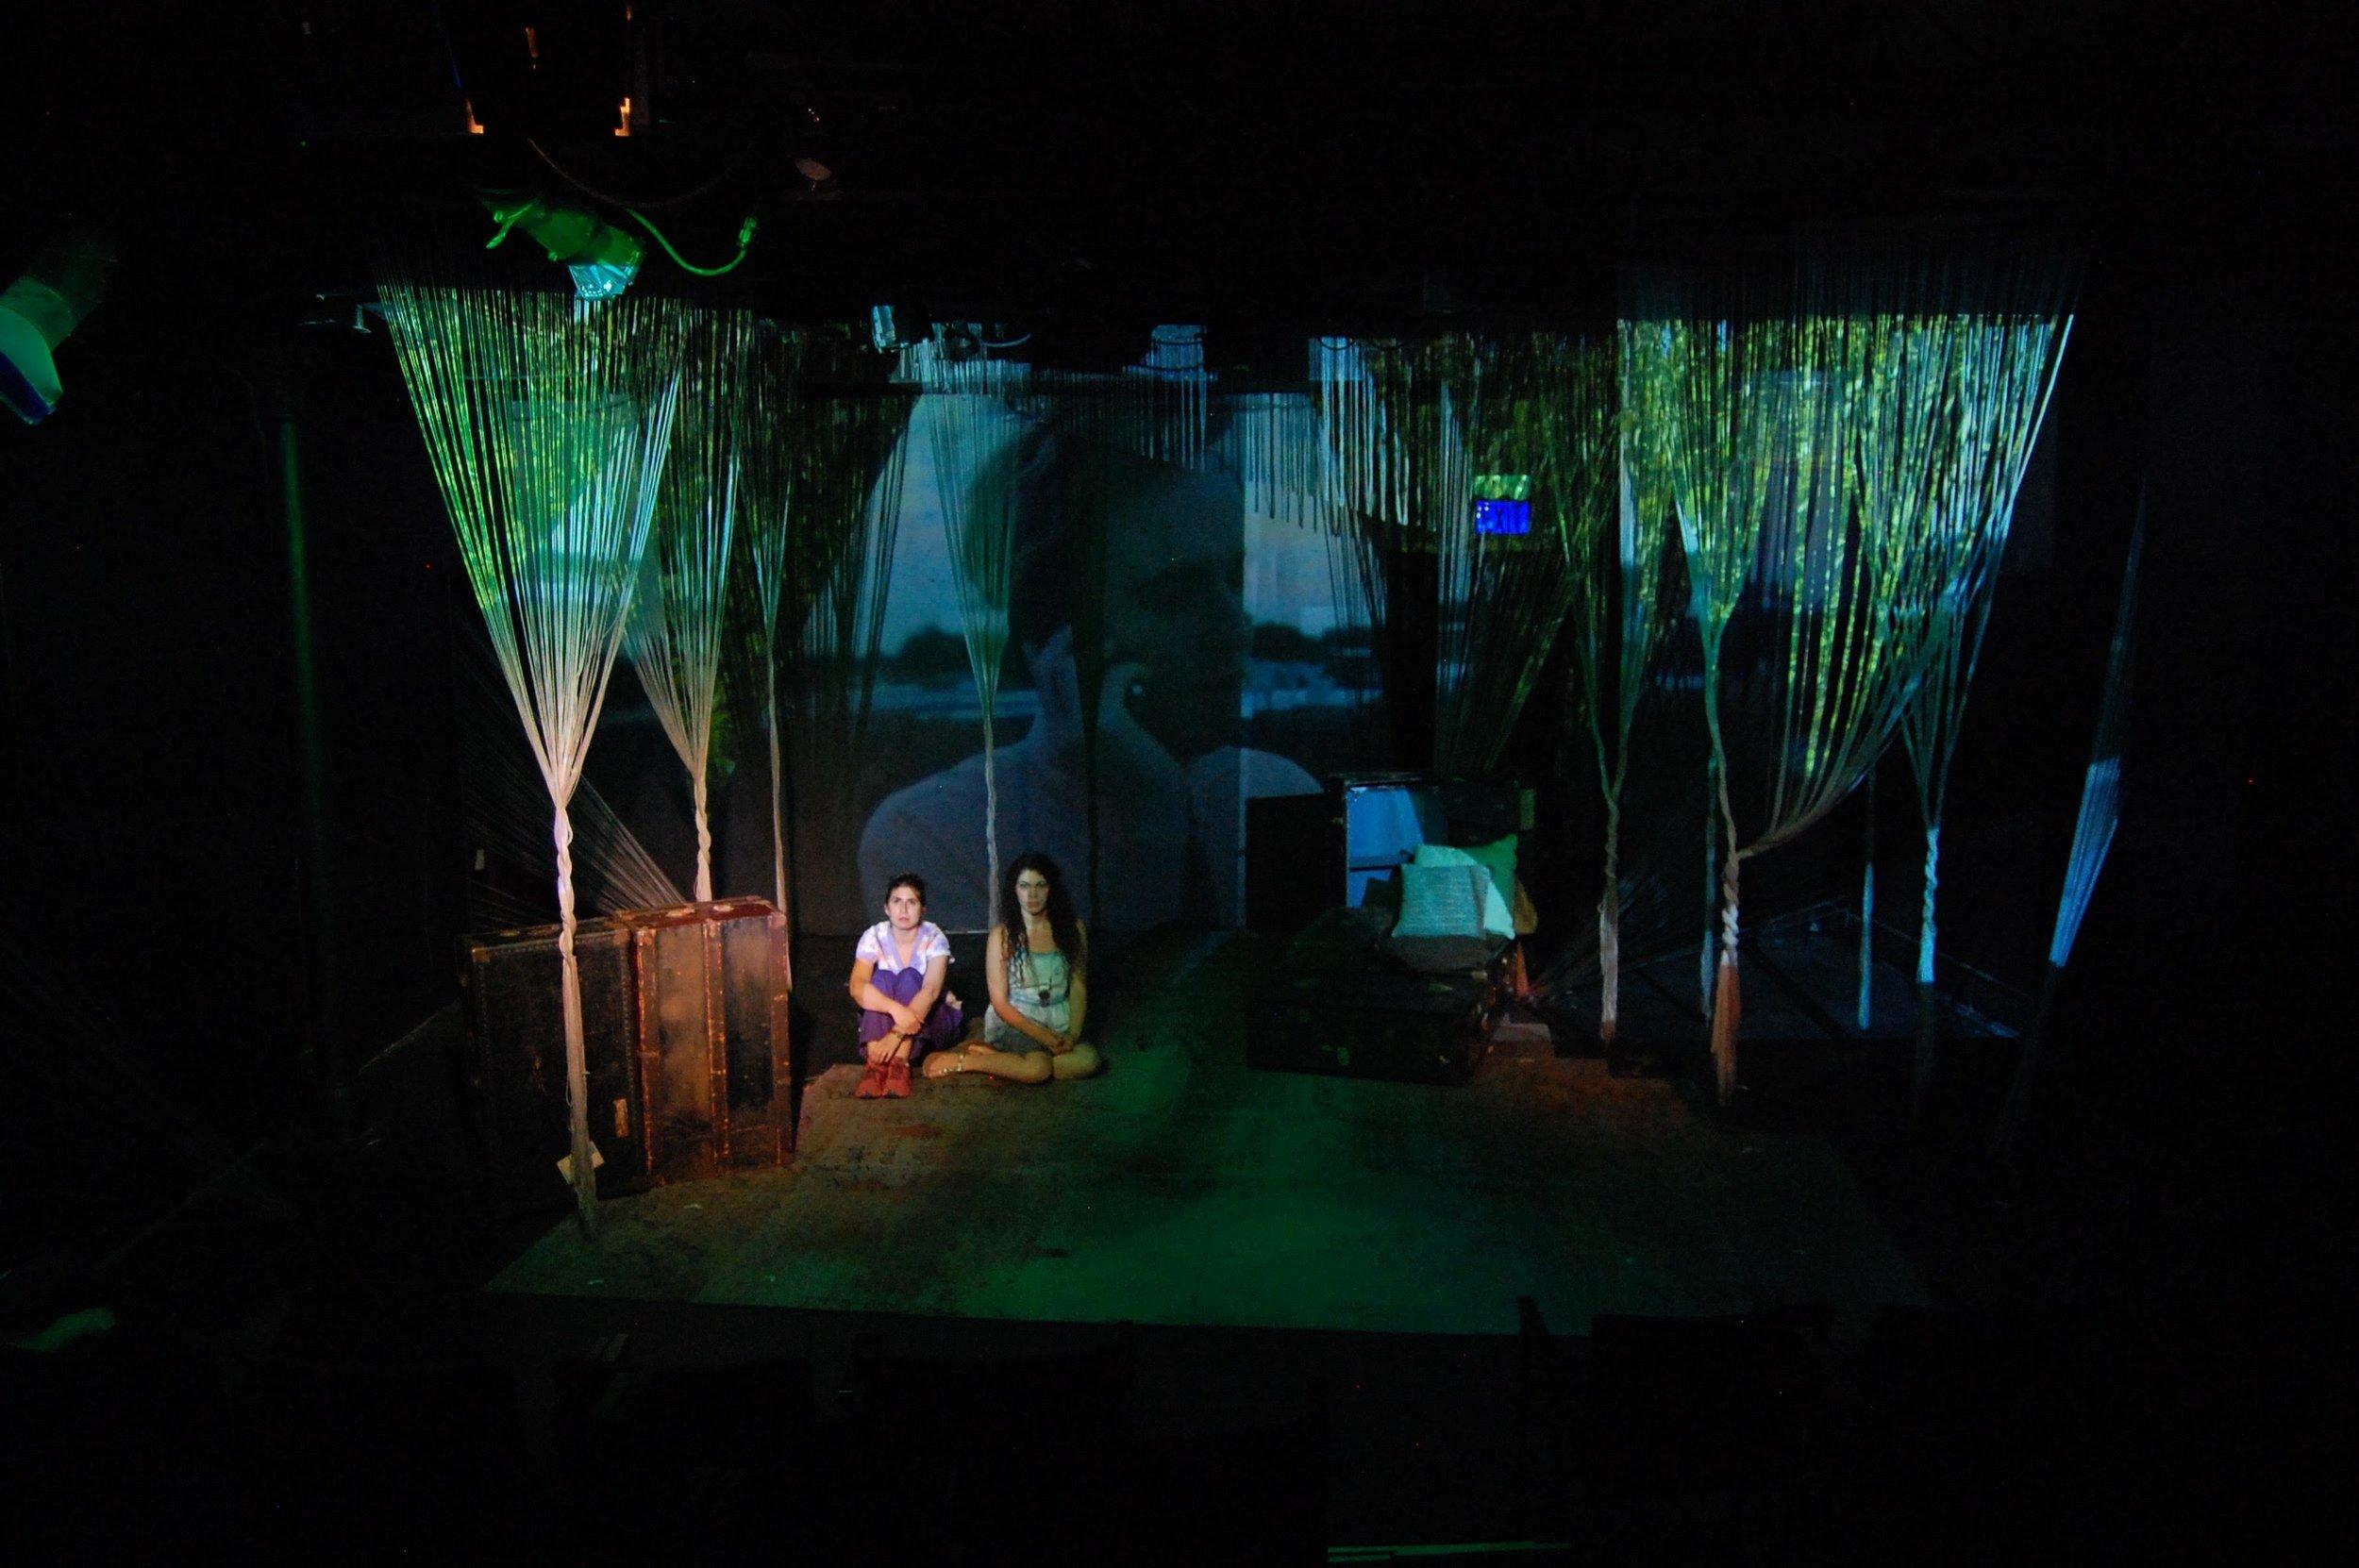 Eurydice releases Orpheus